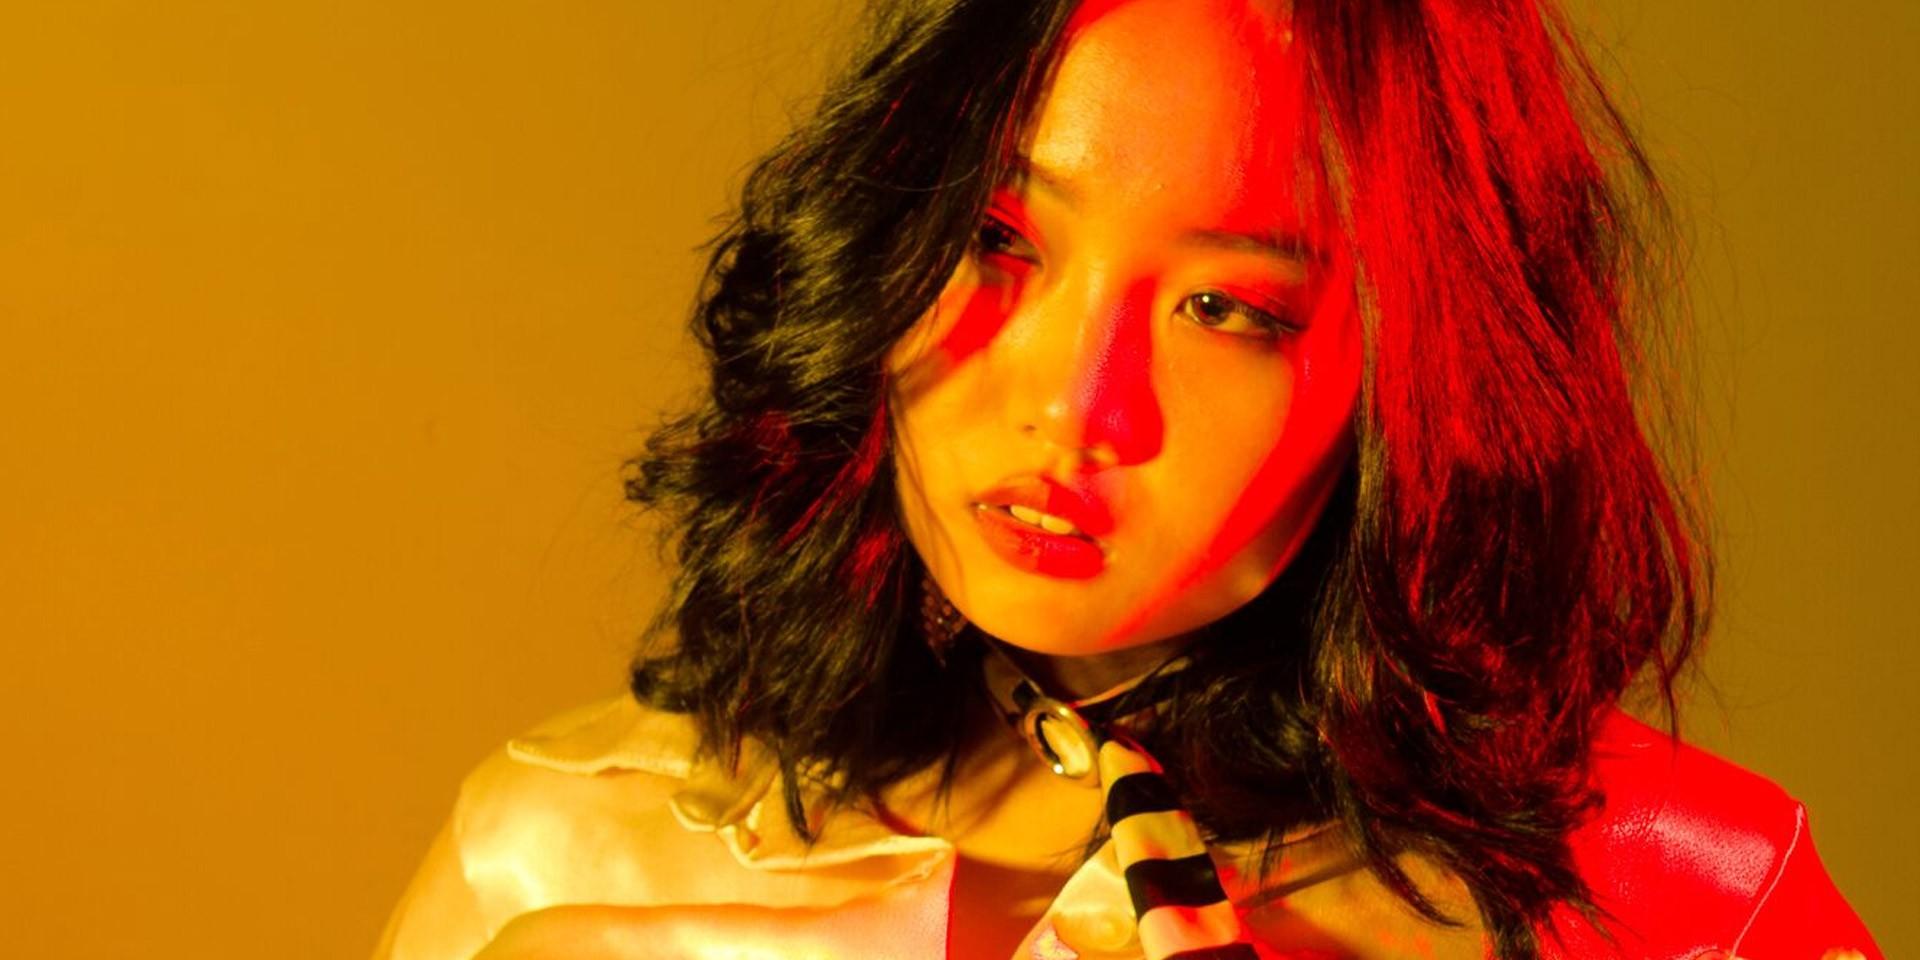 Ena Mori shares new upbeat single 'Telephone' – listen